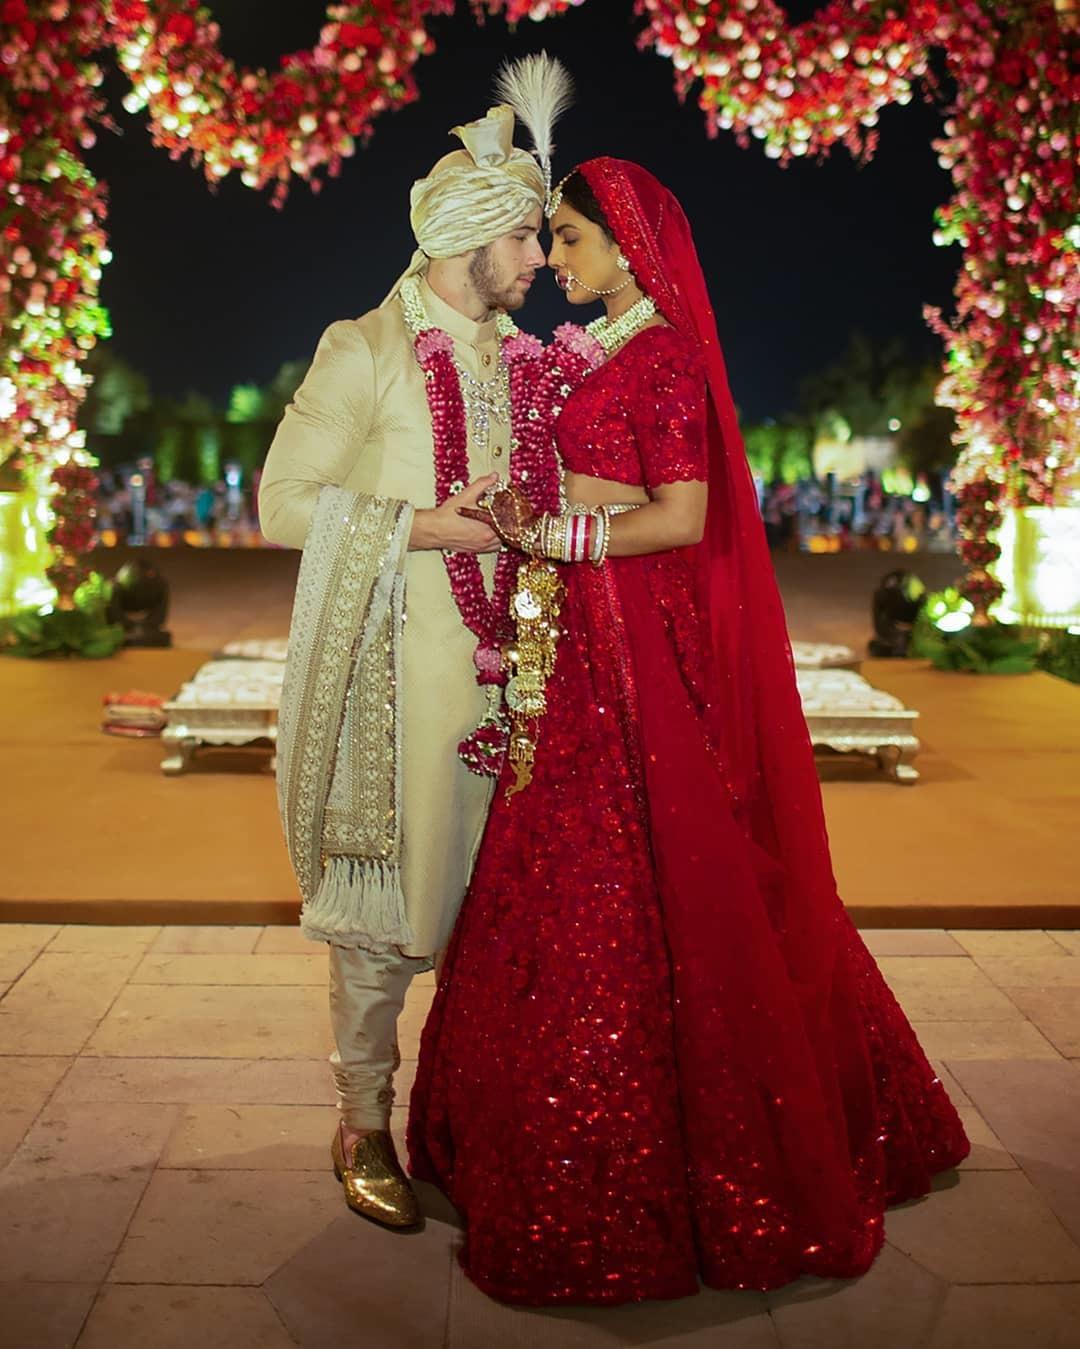 The Hindu wedding (Source Instagram)